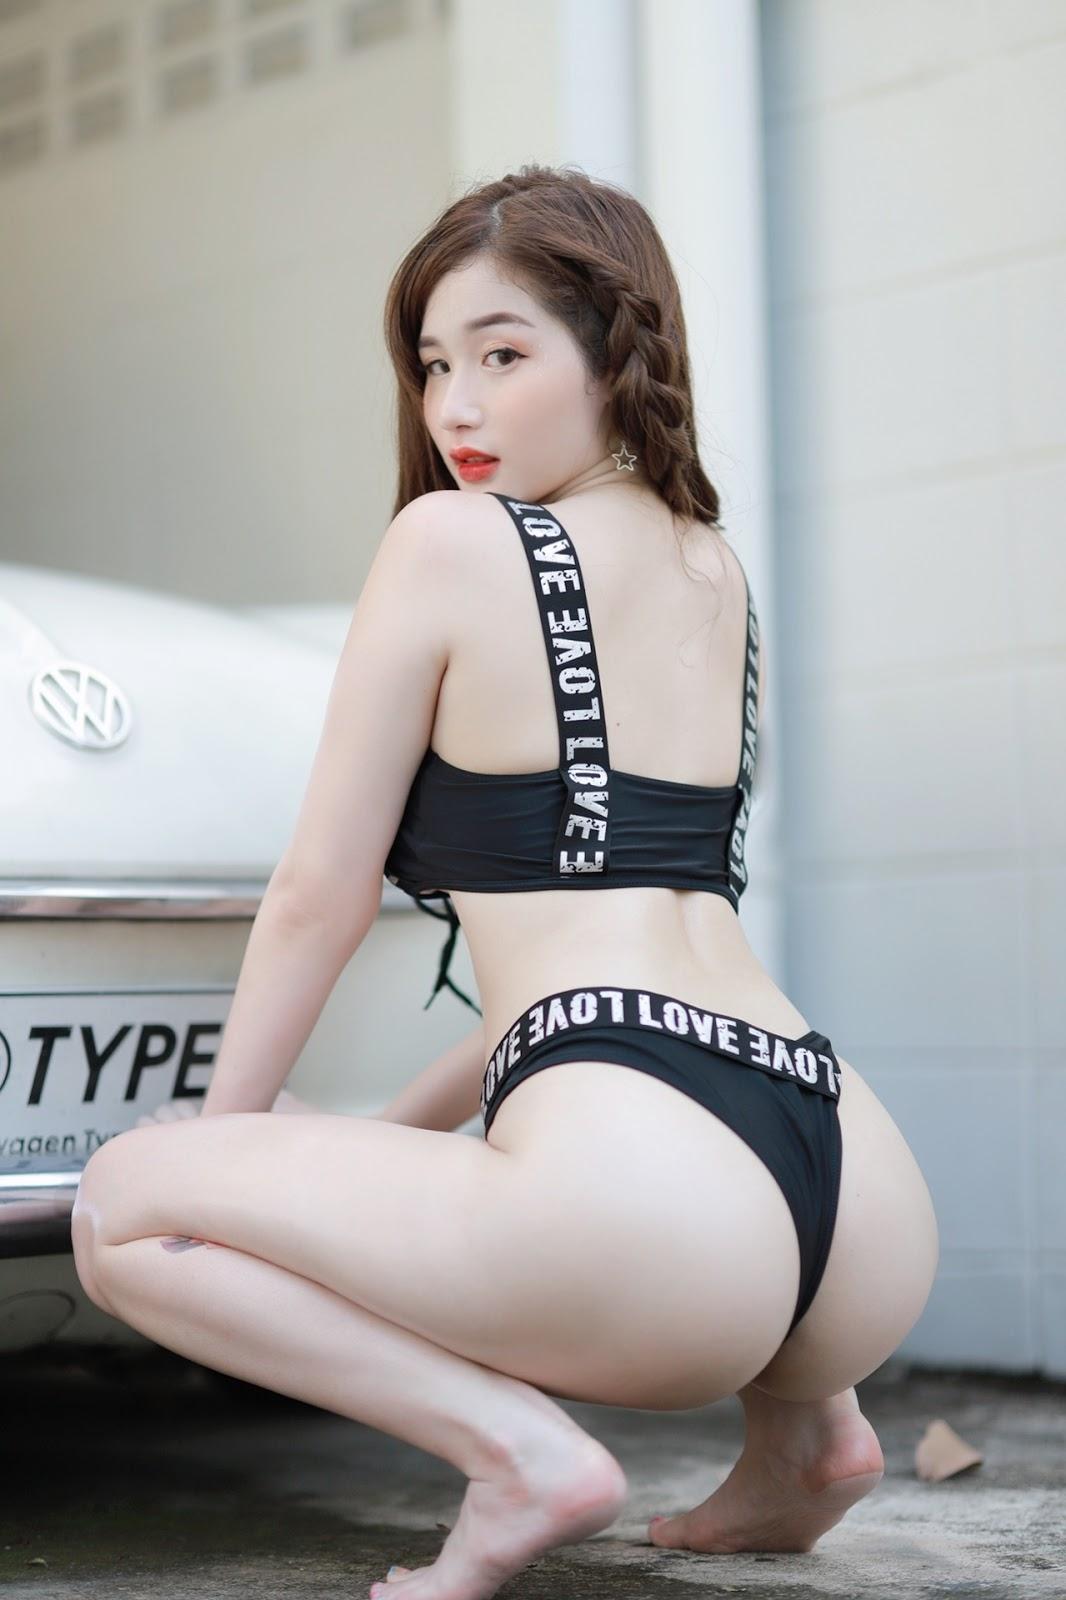 Thailand Beautyful Girl Pic No.276 || AKair